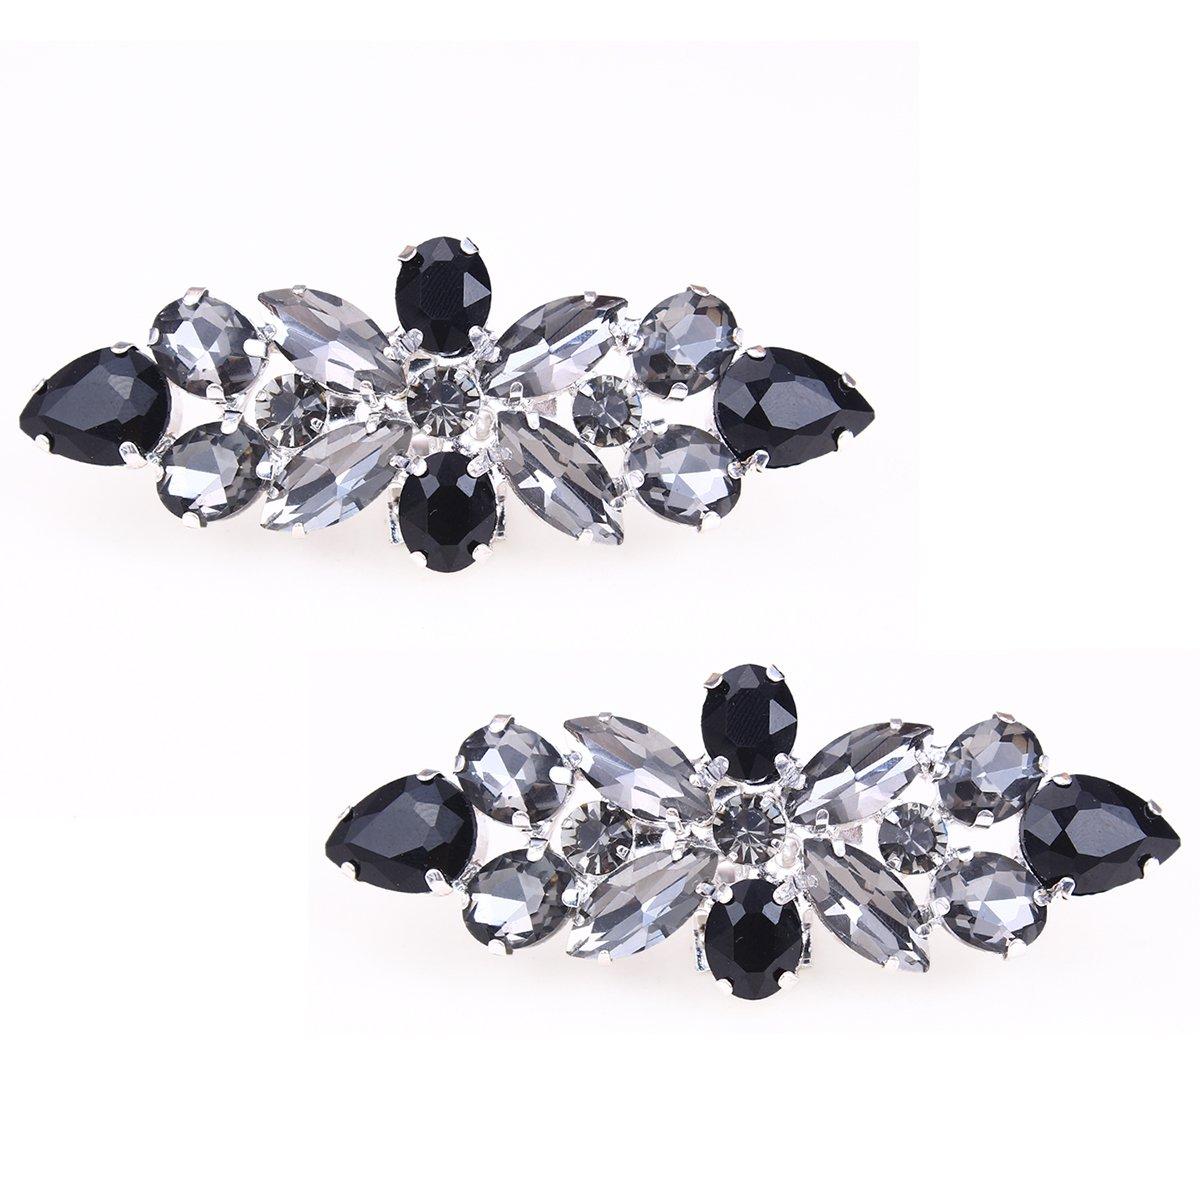 Santfe Fashion Crystal Rhinestone Flower Shoe Buckle Shoe Clips for Bridal Wedding Party Shoe Decoration (Black)